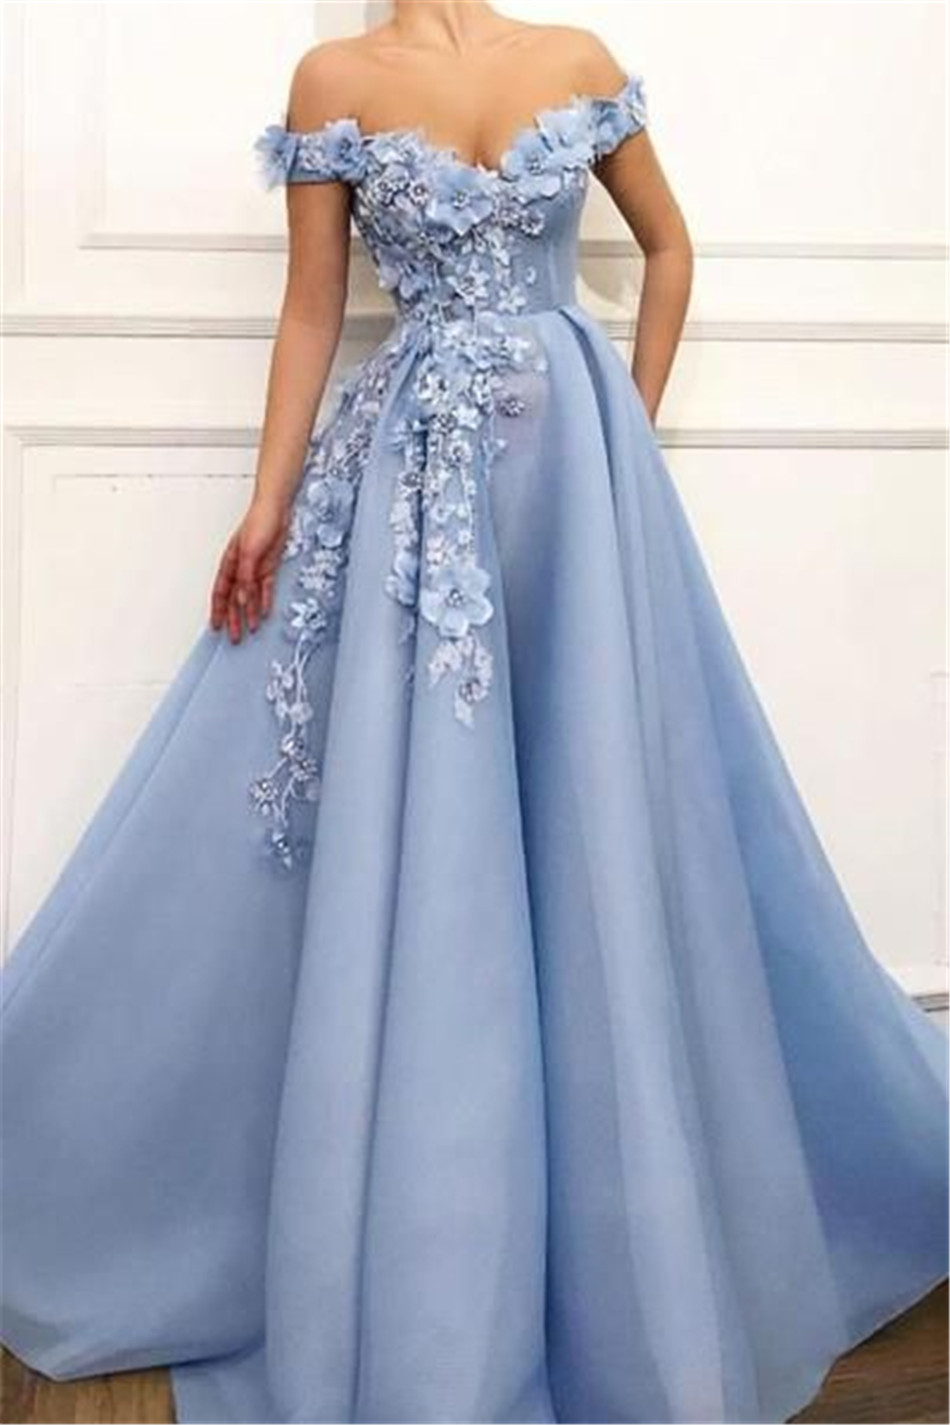 Eightale   Prom     Dresses   off the shoulder   Prom     Dresses   Flowers Appliques Beautiful Princess   dress   Satin Backless robe de soiree